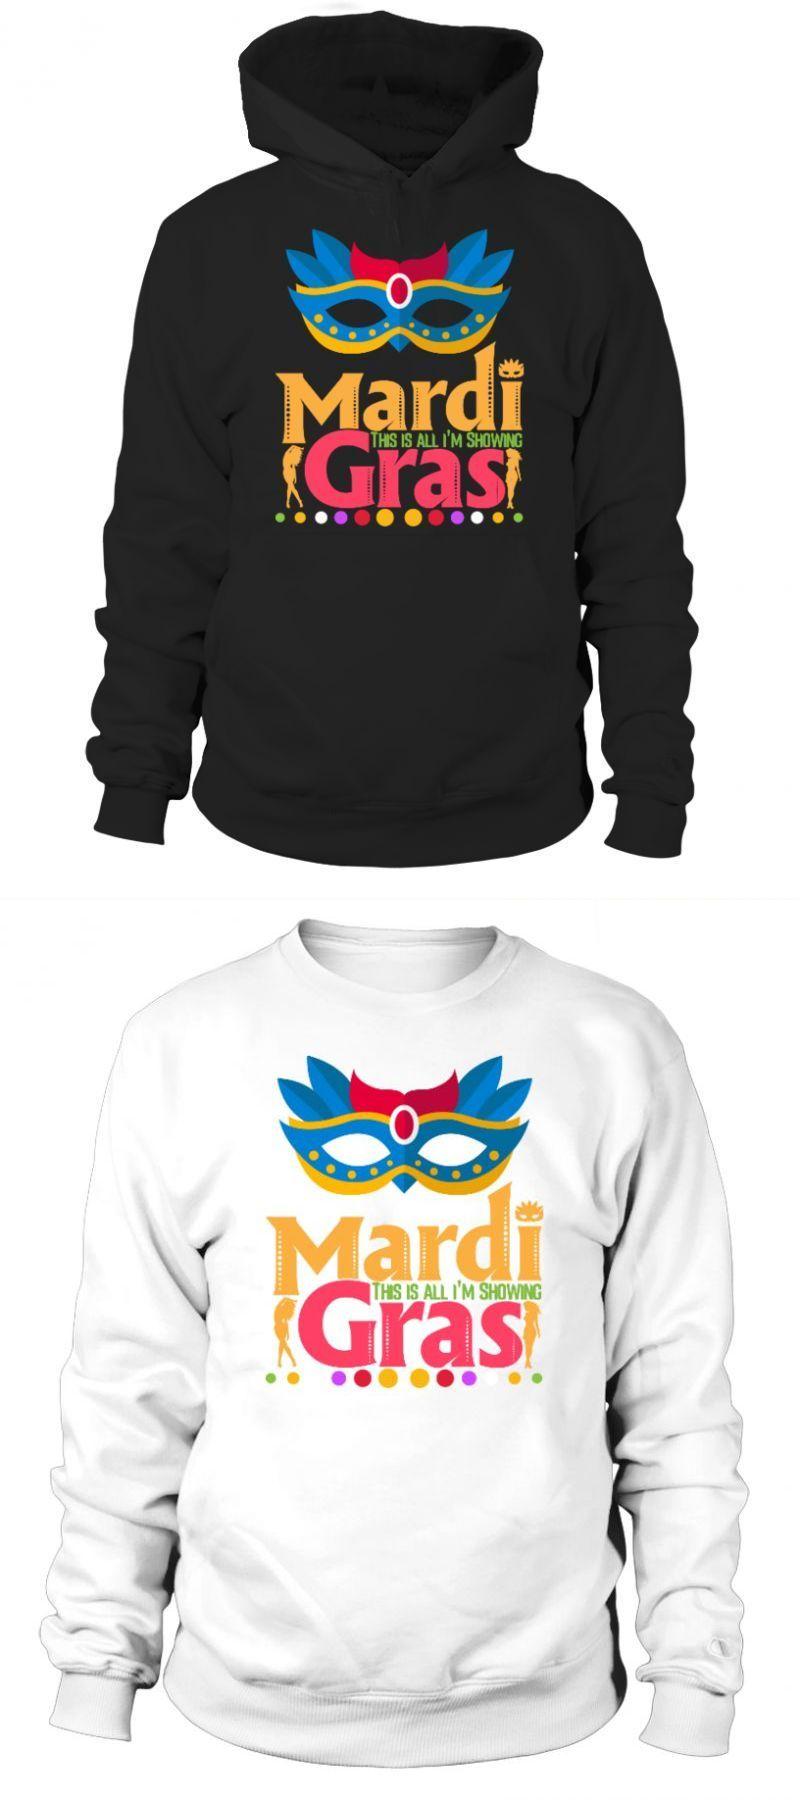 3157fb39 Mardi gras t shirt designs mardi gras shirts hoodie mardi gras t shirts  amazon #mardi #gras #shirt #designs #shirts #hoodie #amazon #new #orleans  #unisex # ...